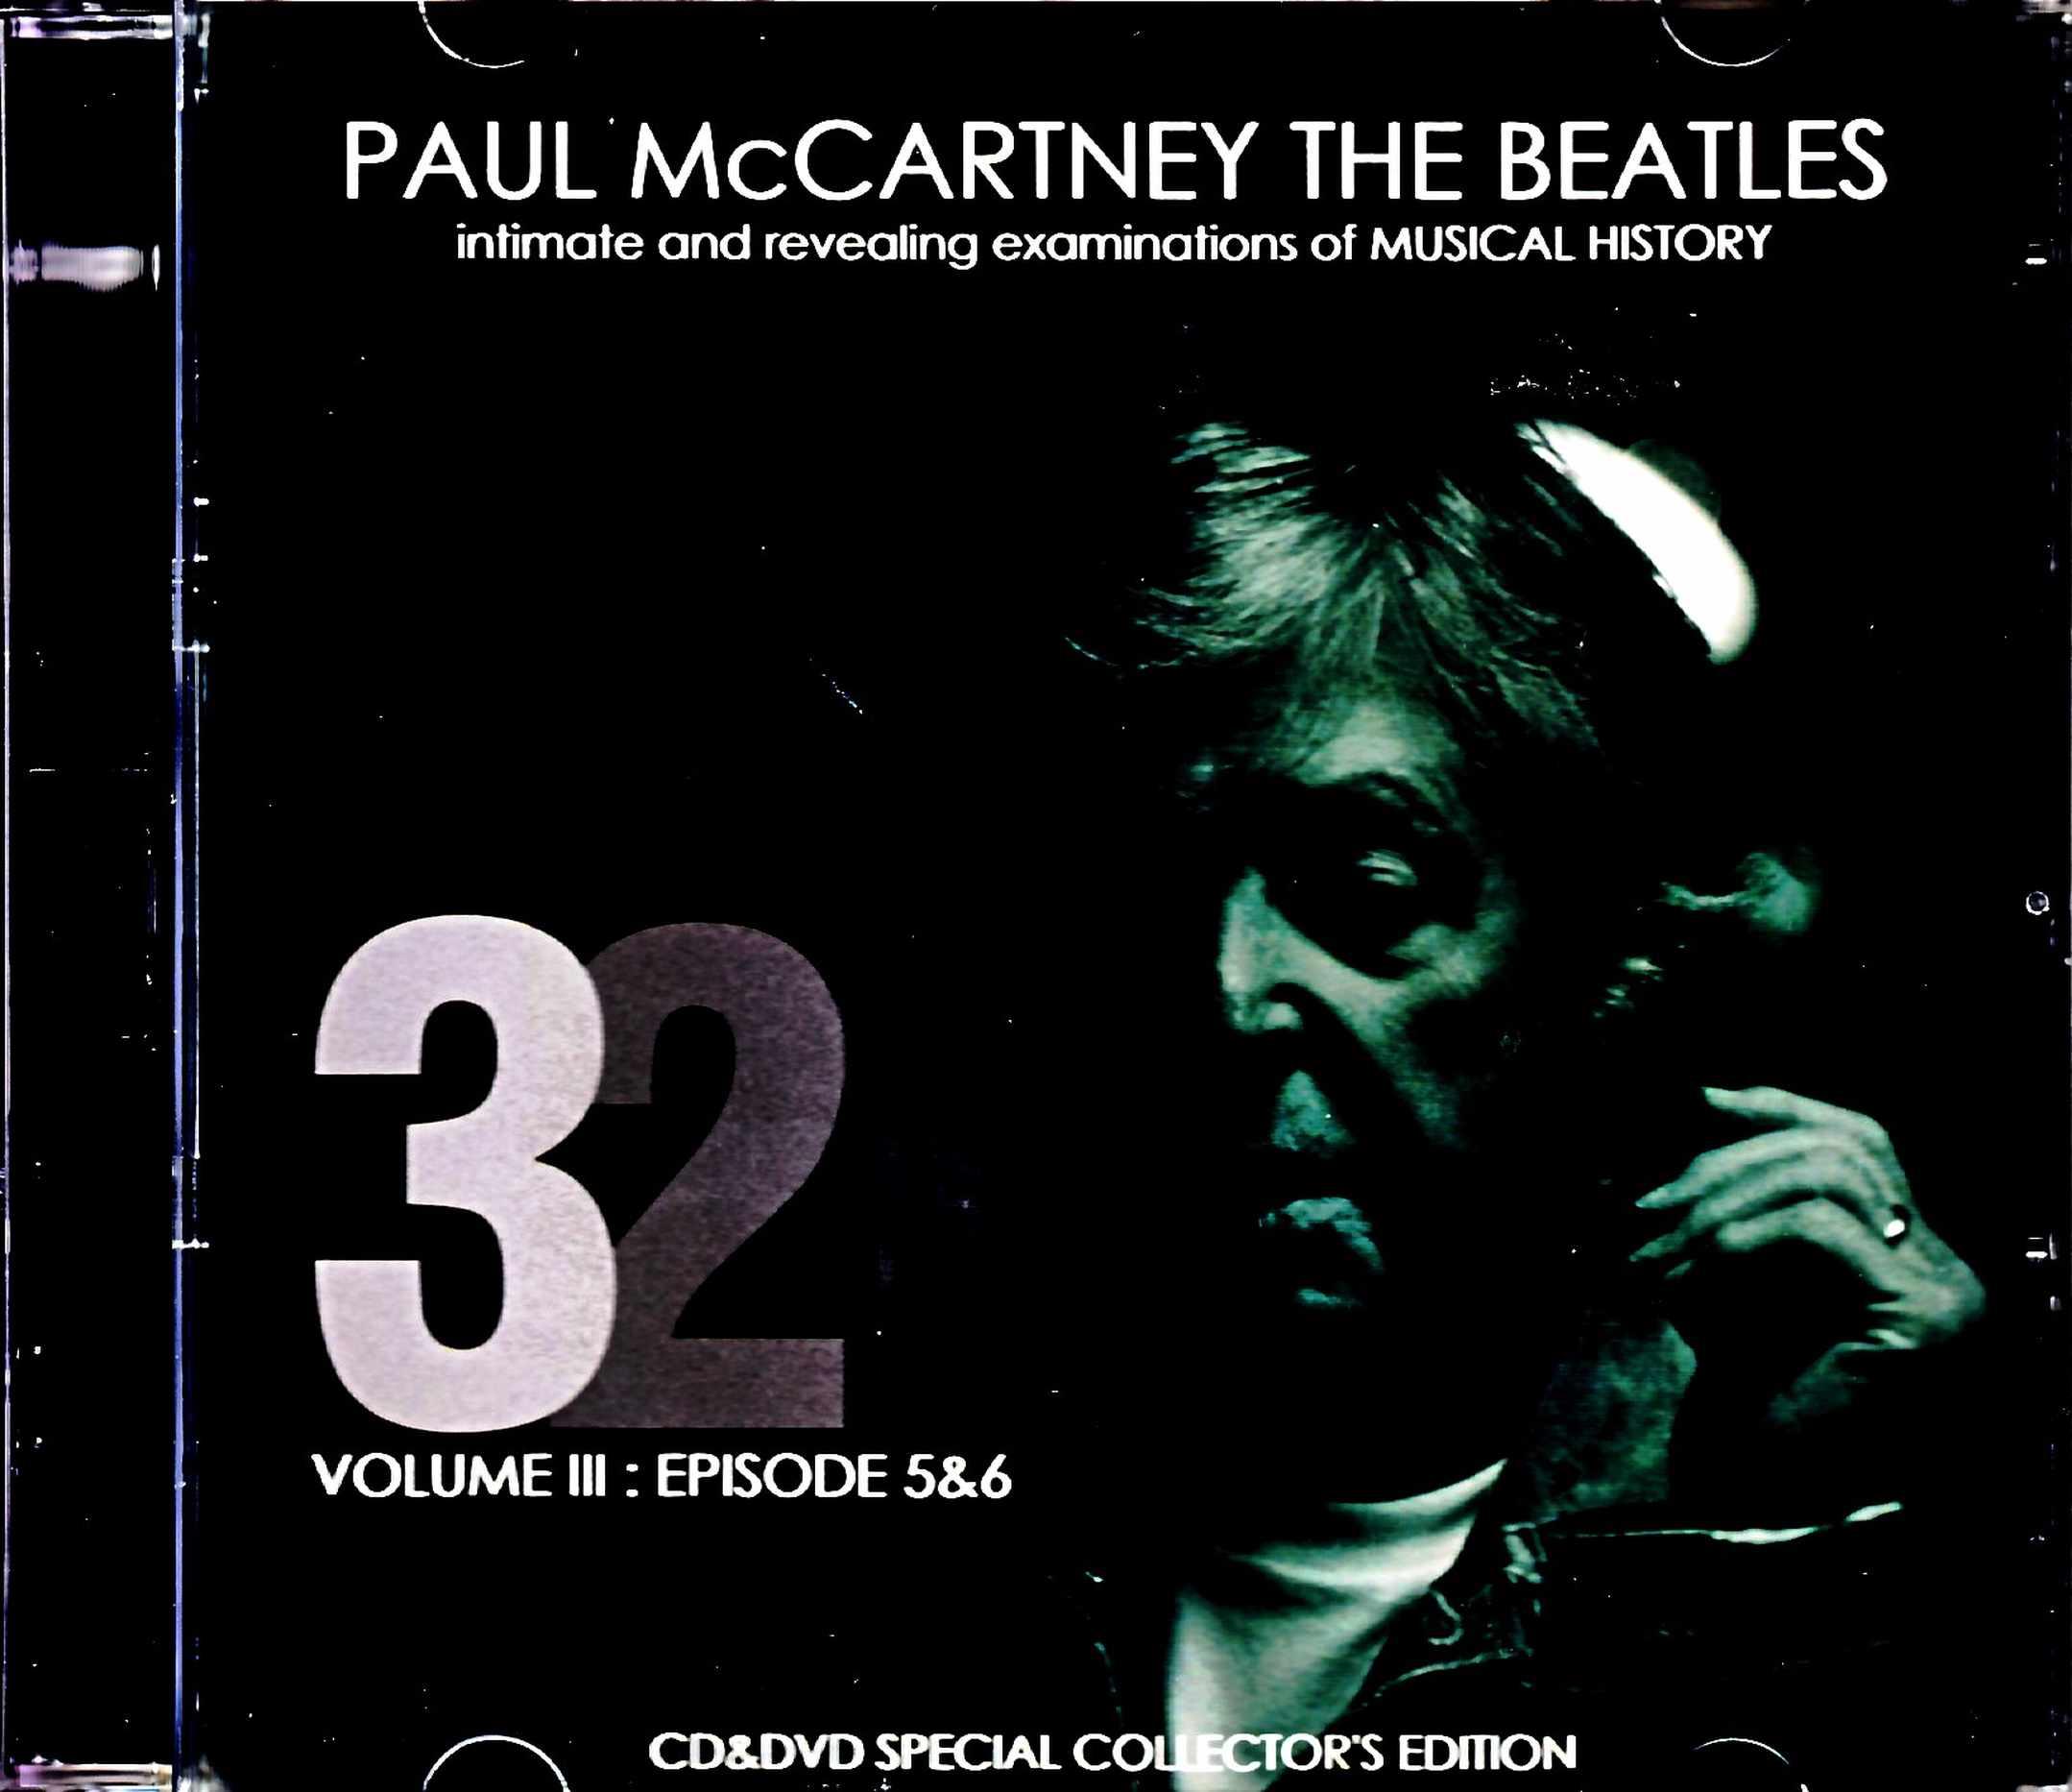 Paul McCartney Beatles ポール・マッカートニー ビートルズ/321 Intimate and Revealing of Music History Vol.3